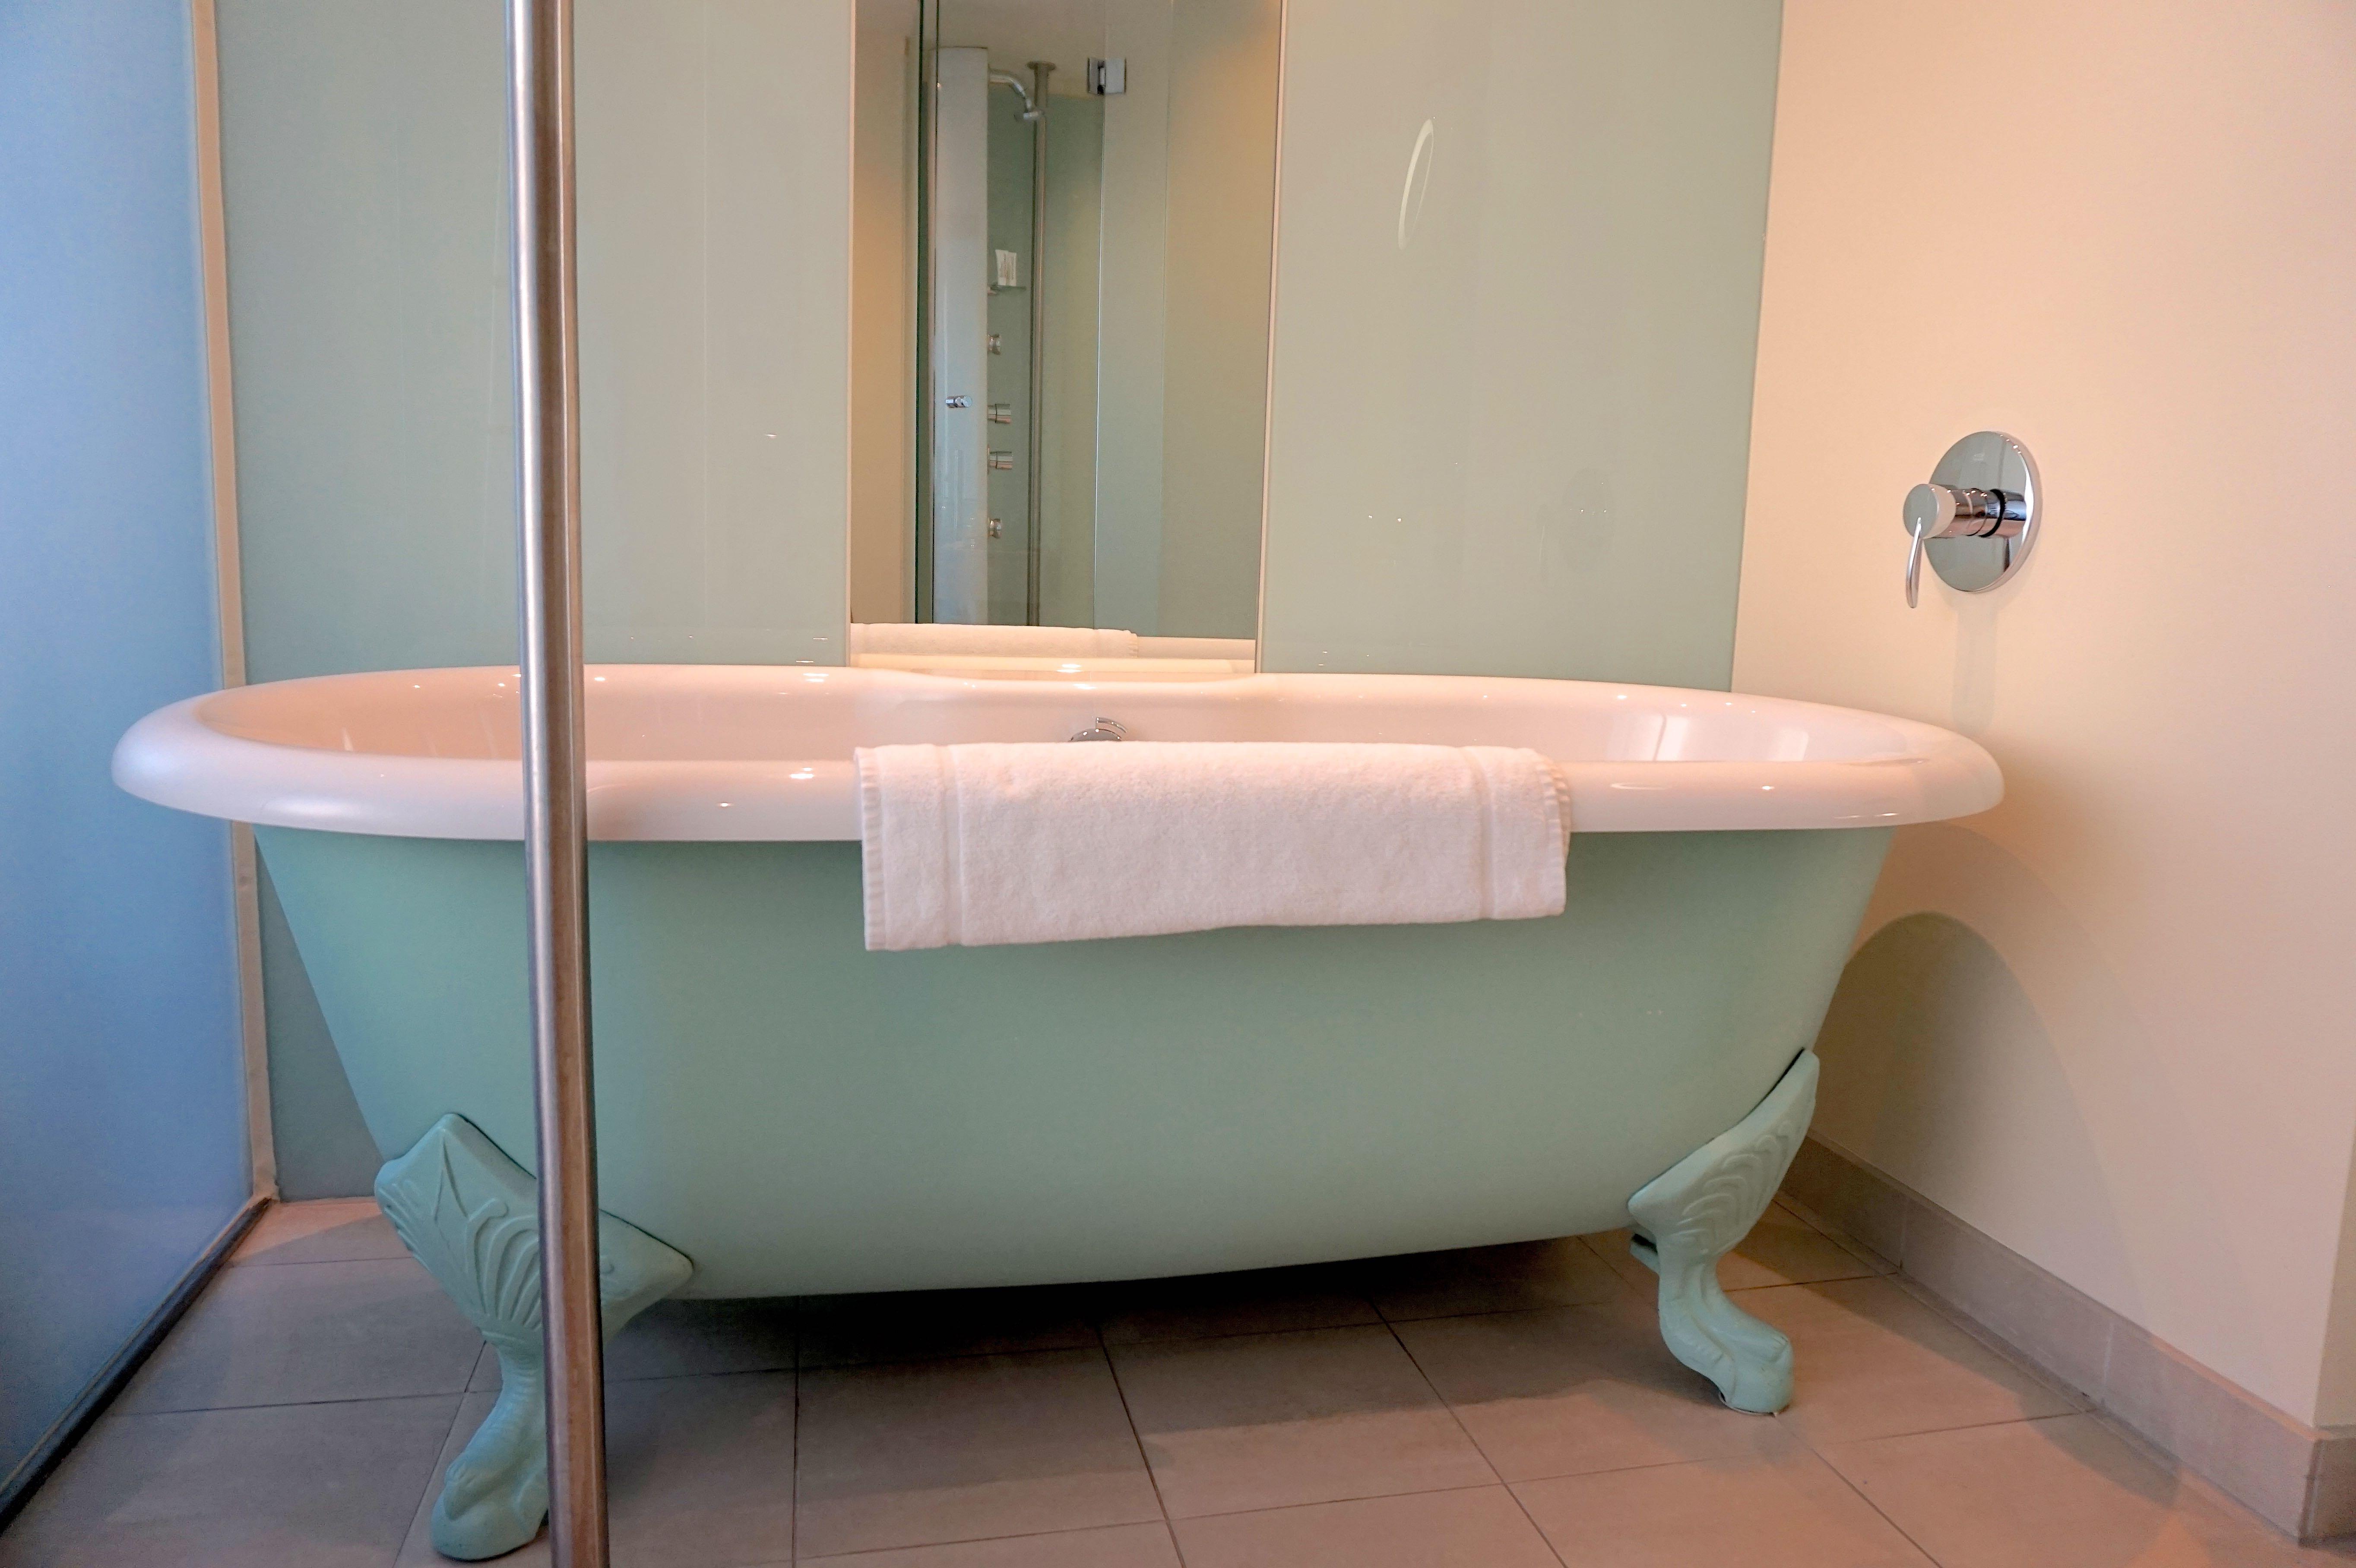 Le Meridien hotel Vienna review